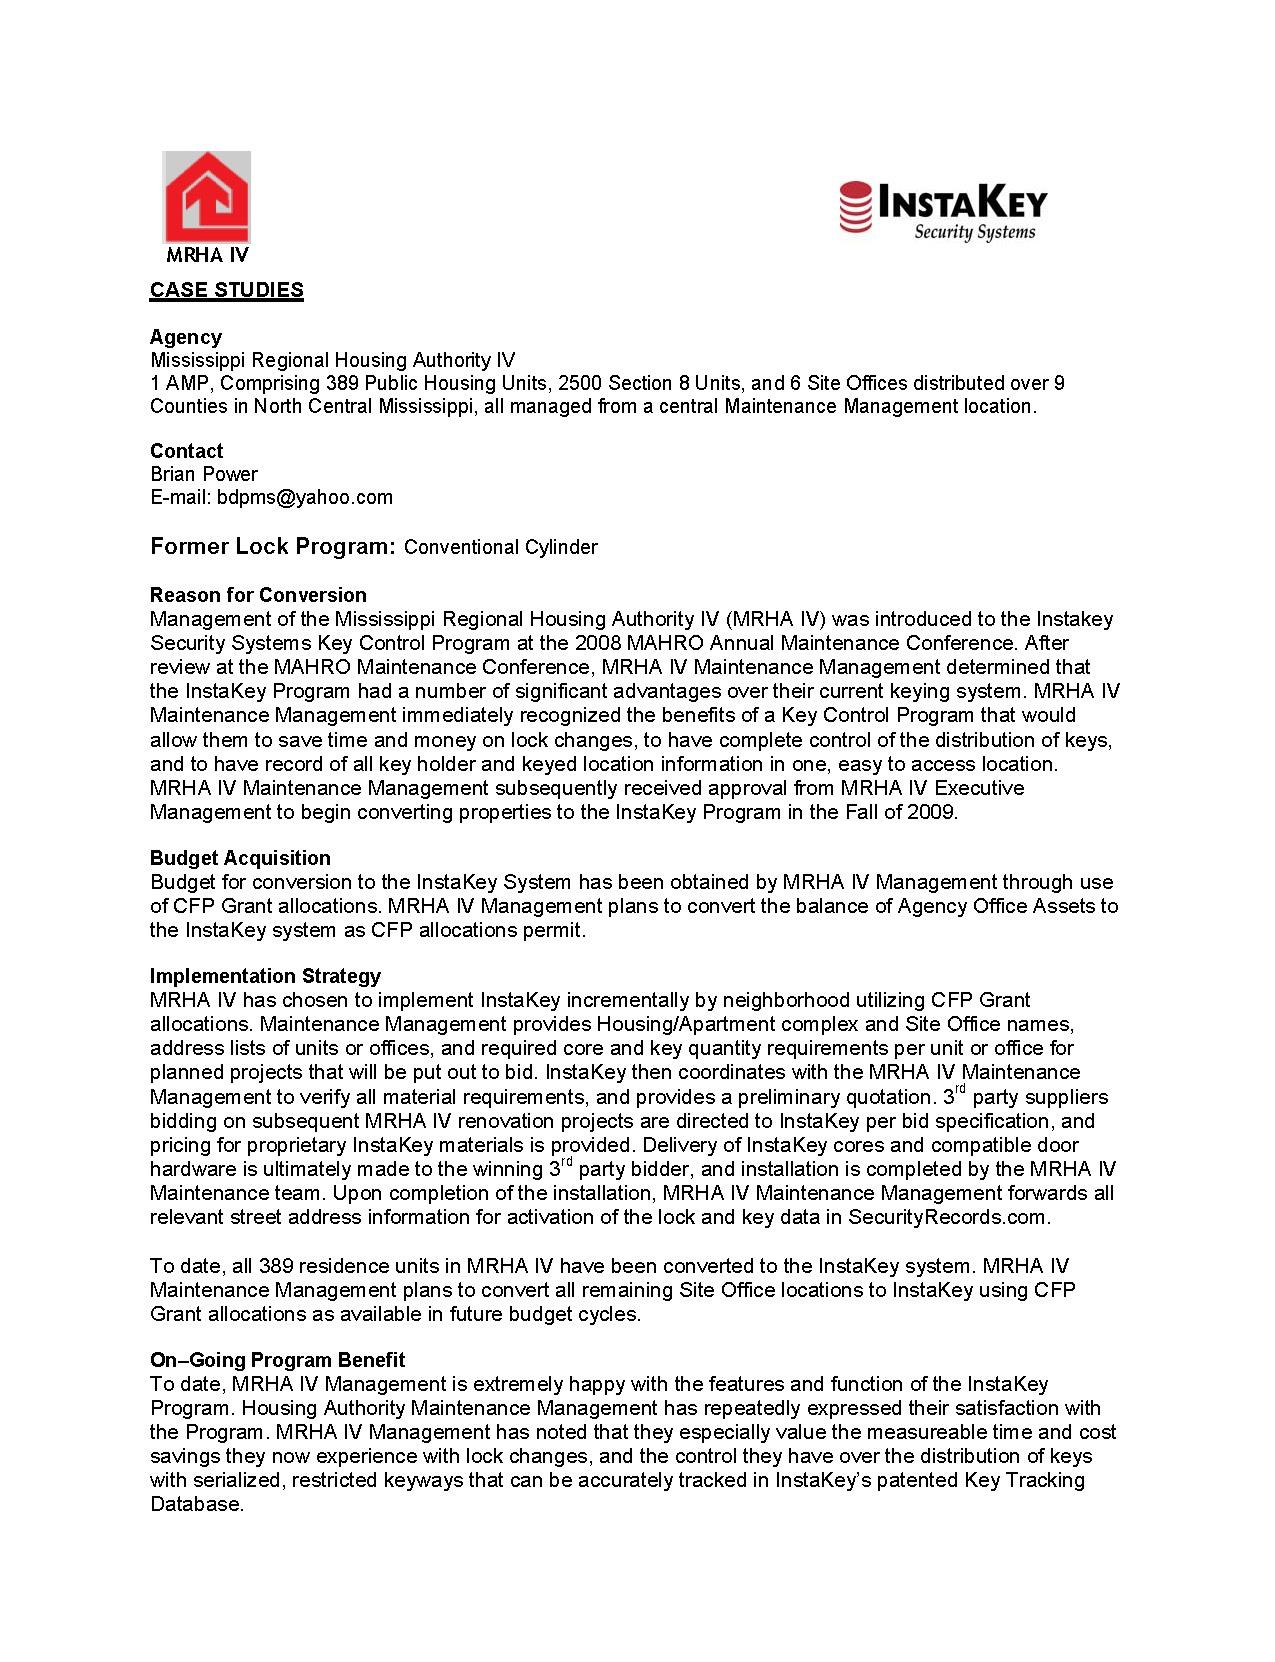 Mississippi Regional Housing Authority IV – A Case Study